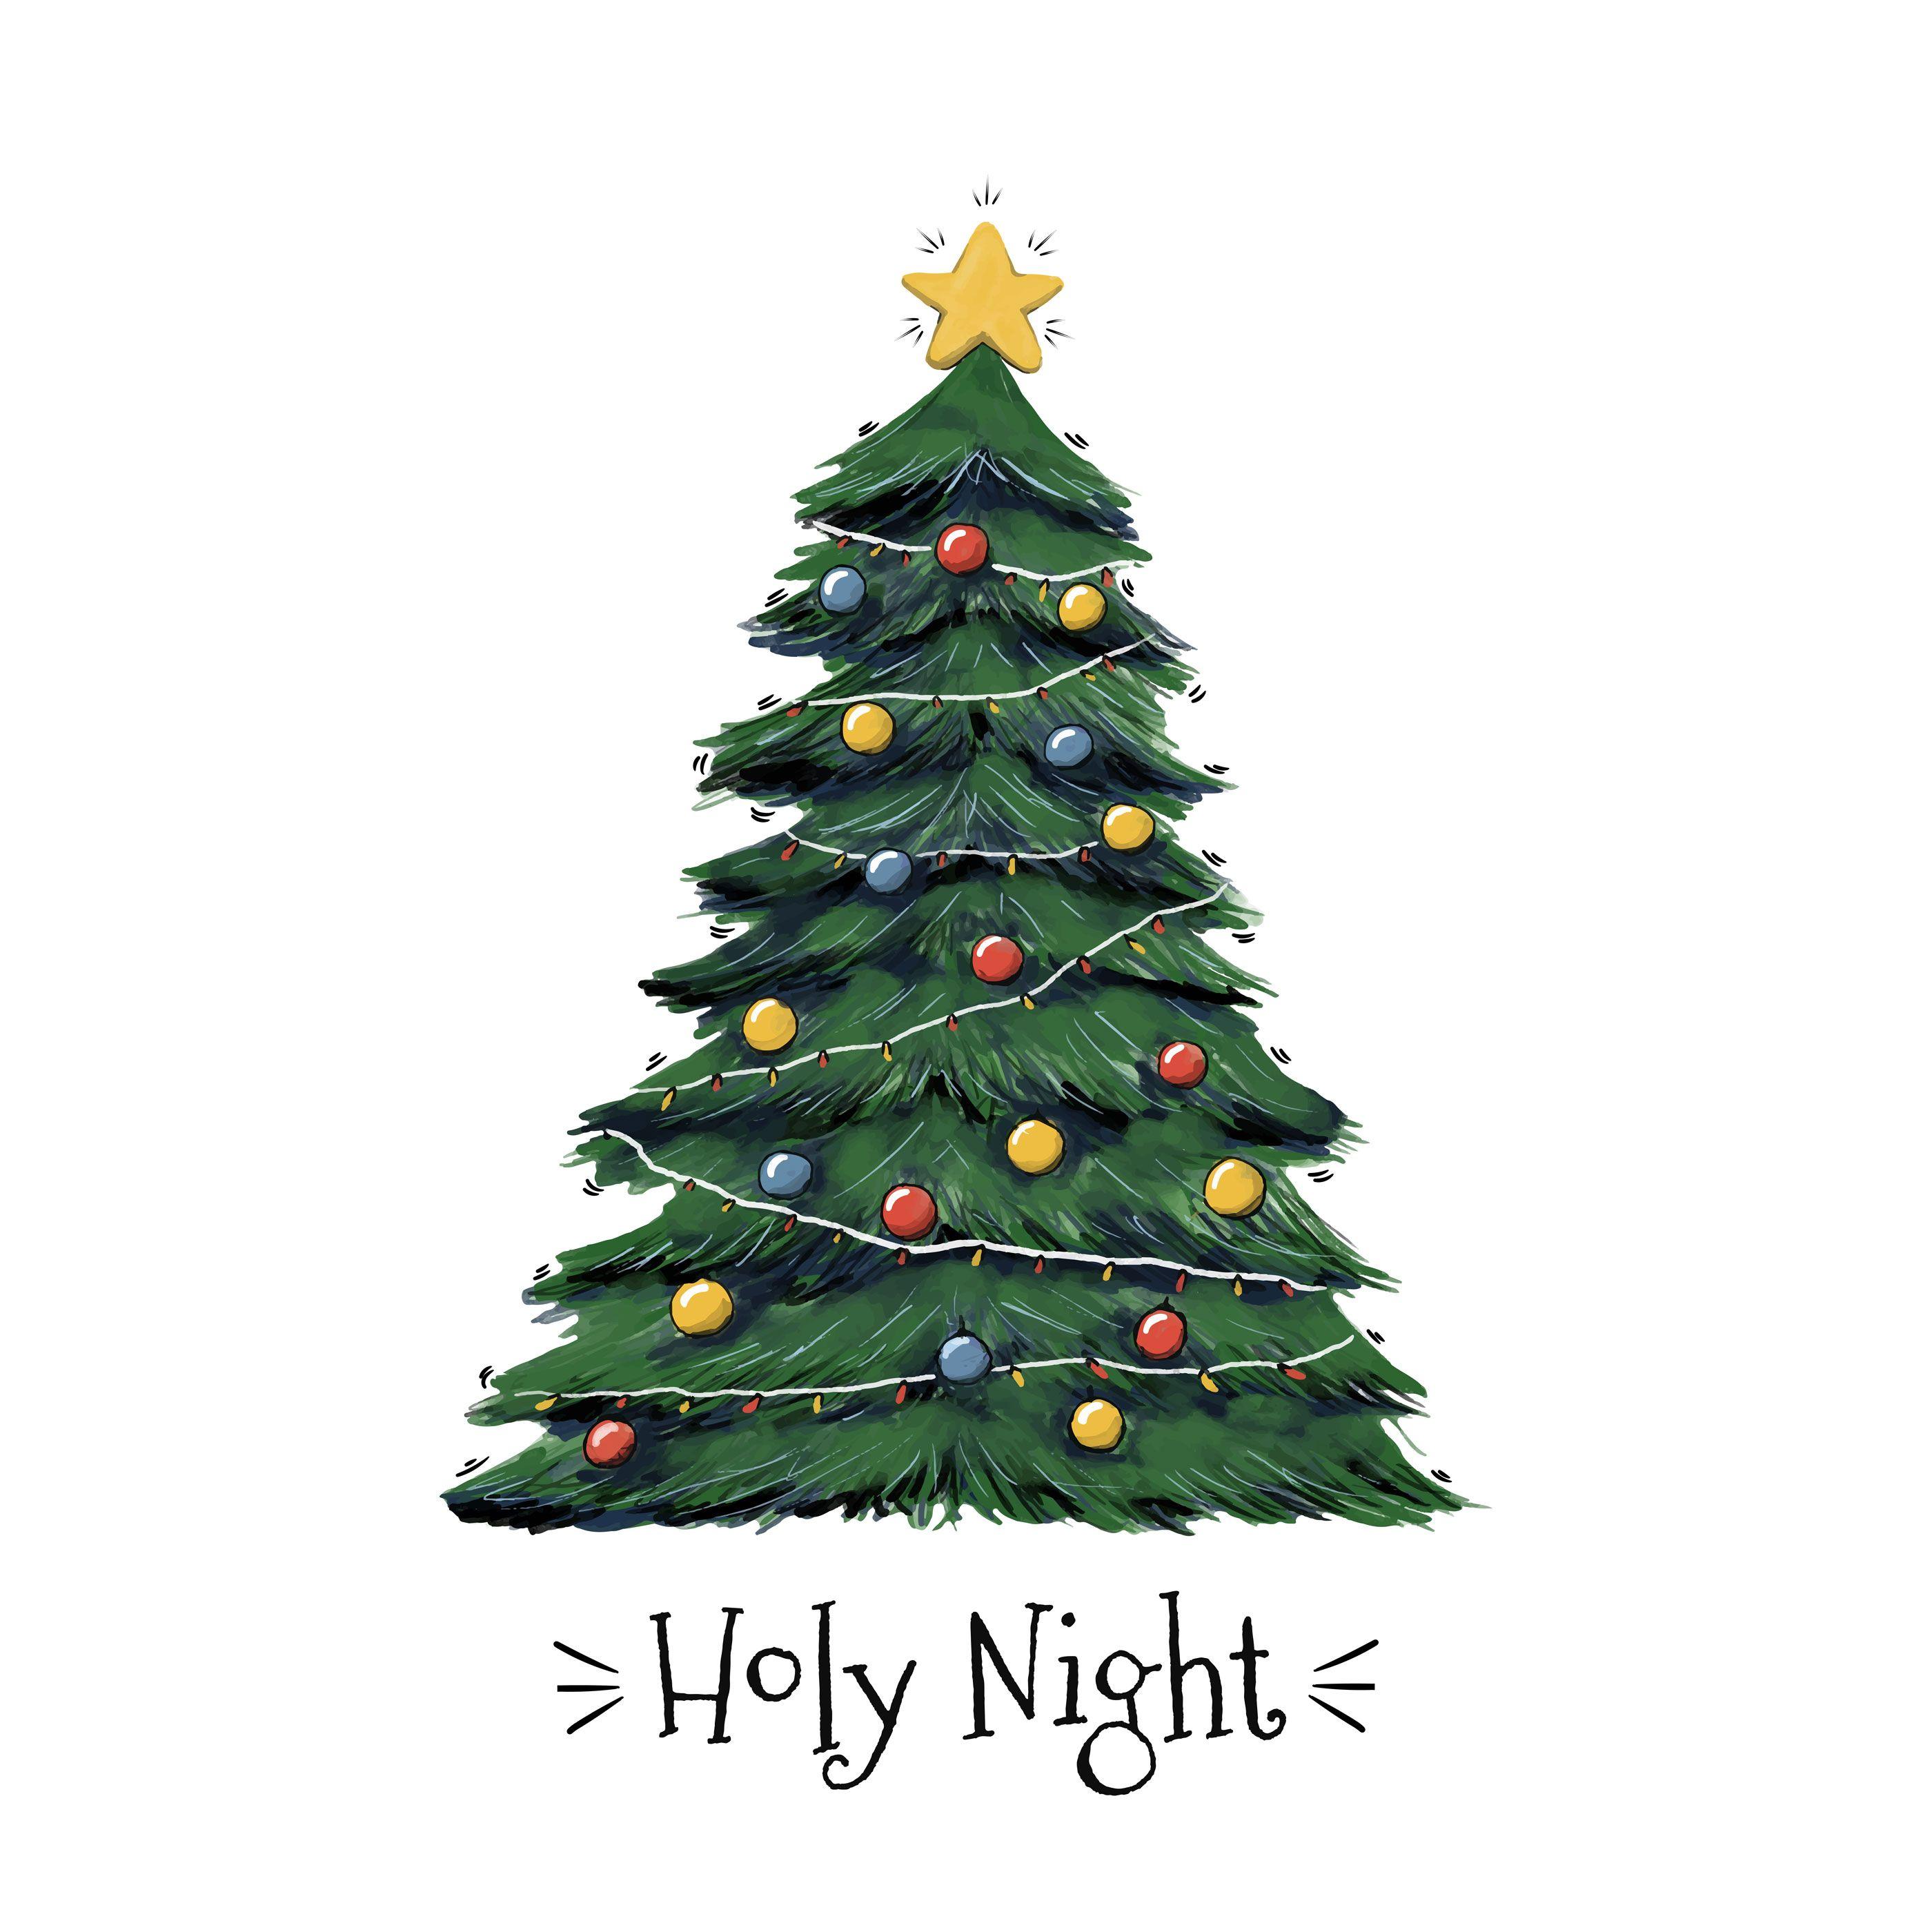 Holy Night Christmas Tree Vector Christmas tree drawing